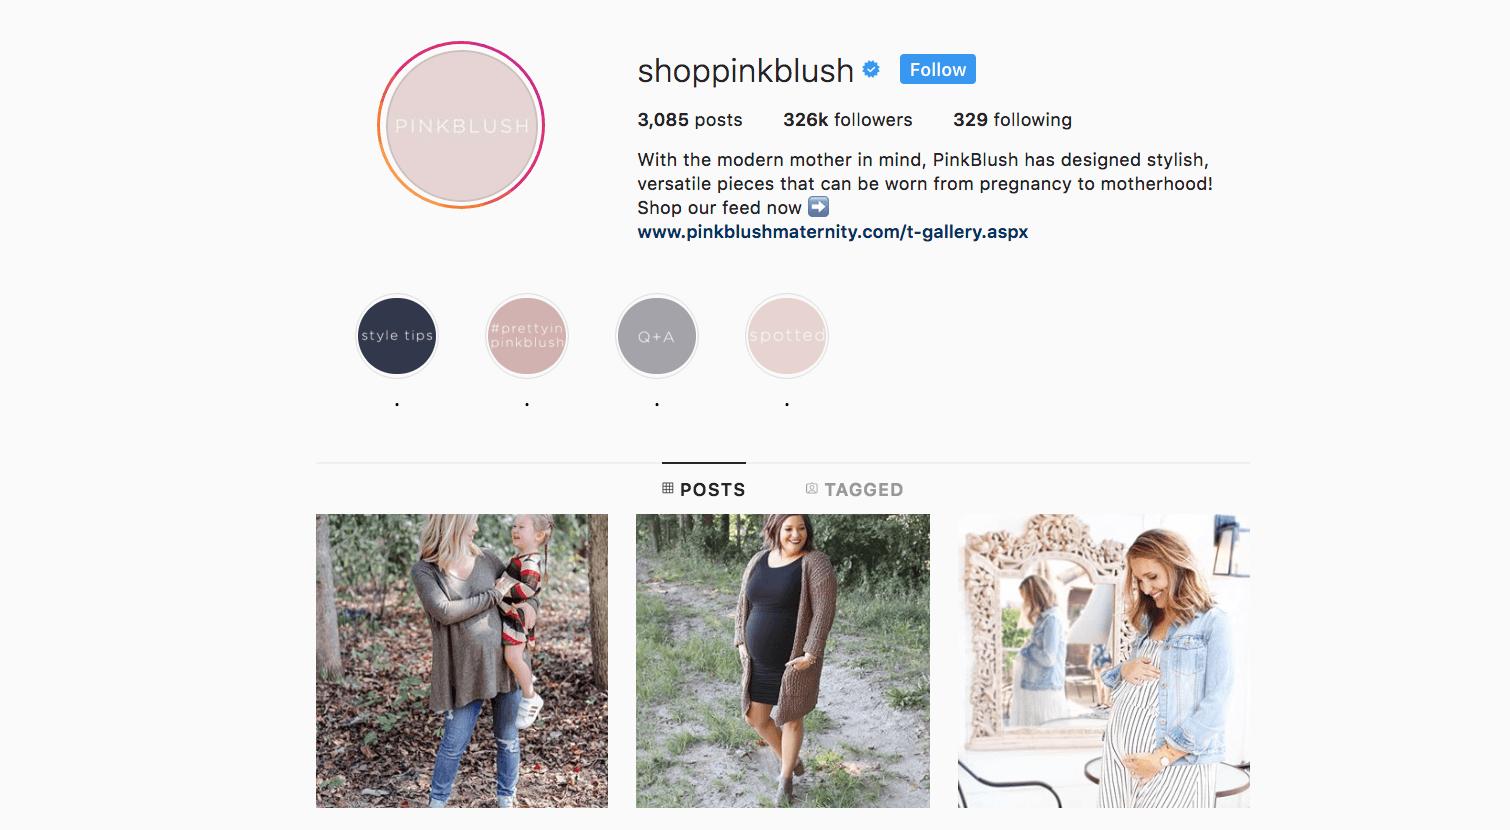 shoppinkblush verified on instagram